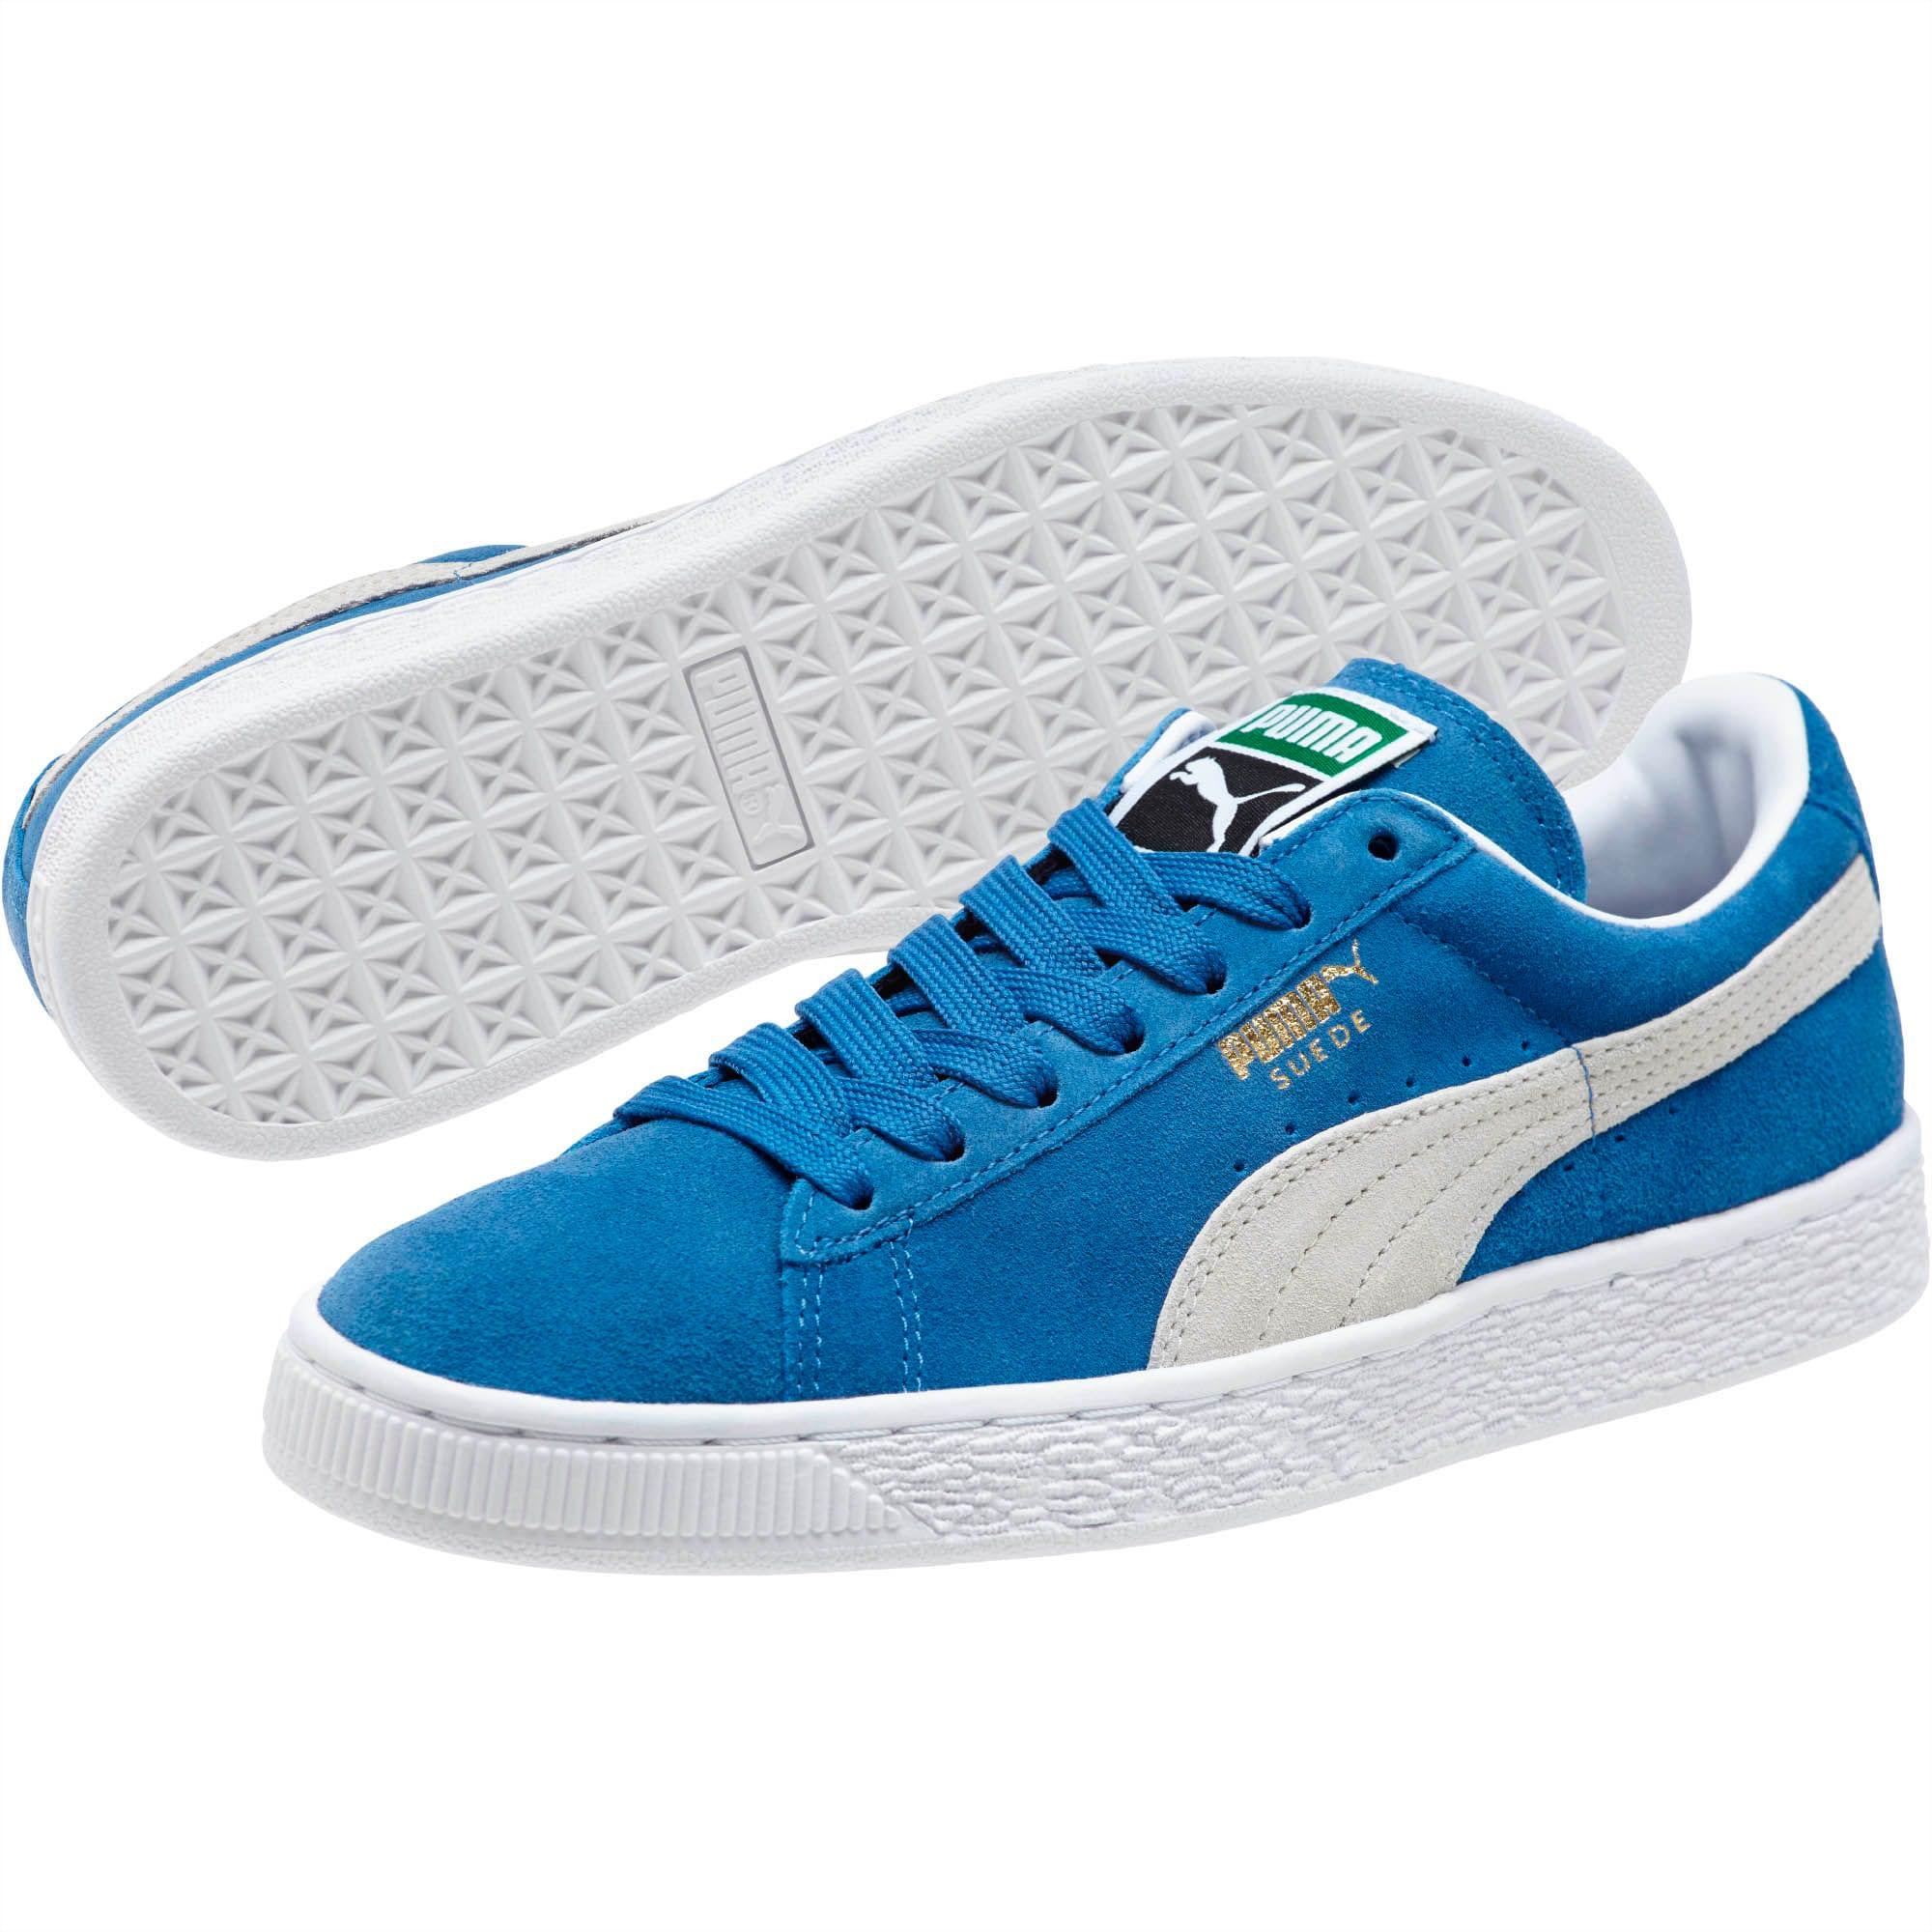 puma suede green blue